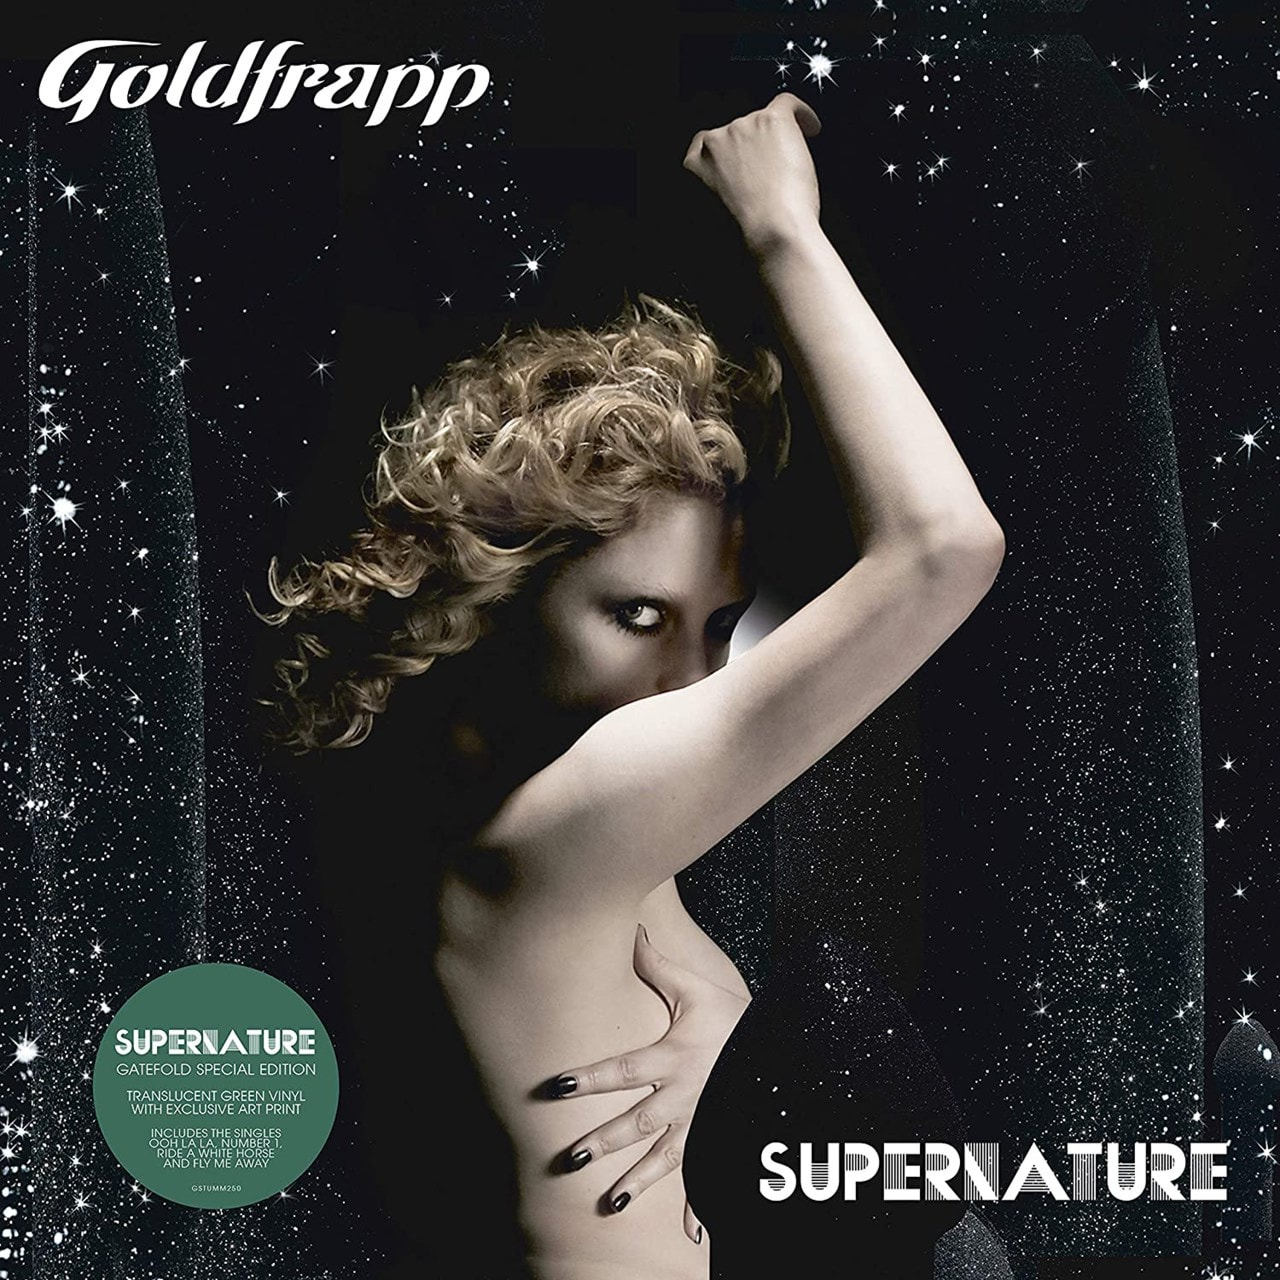 Supernature - 1